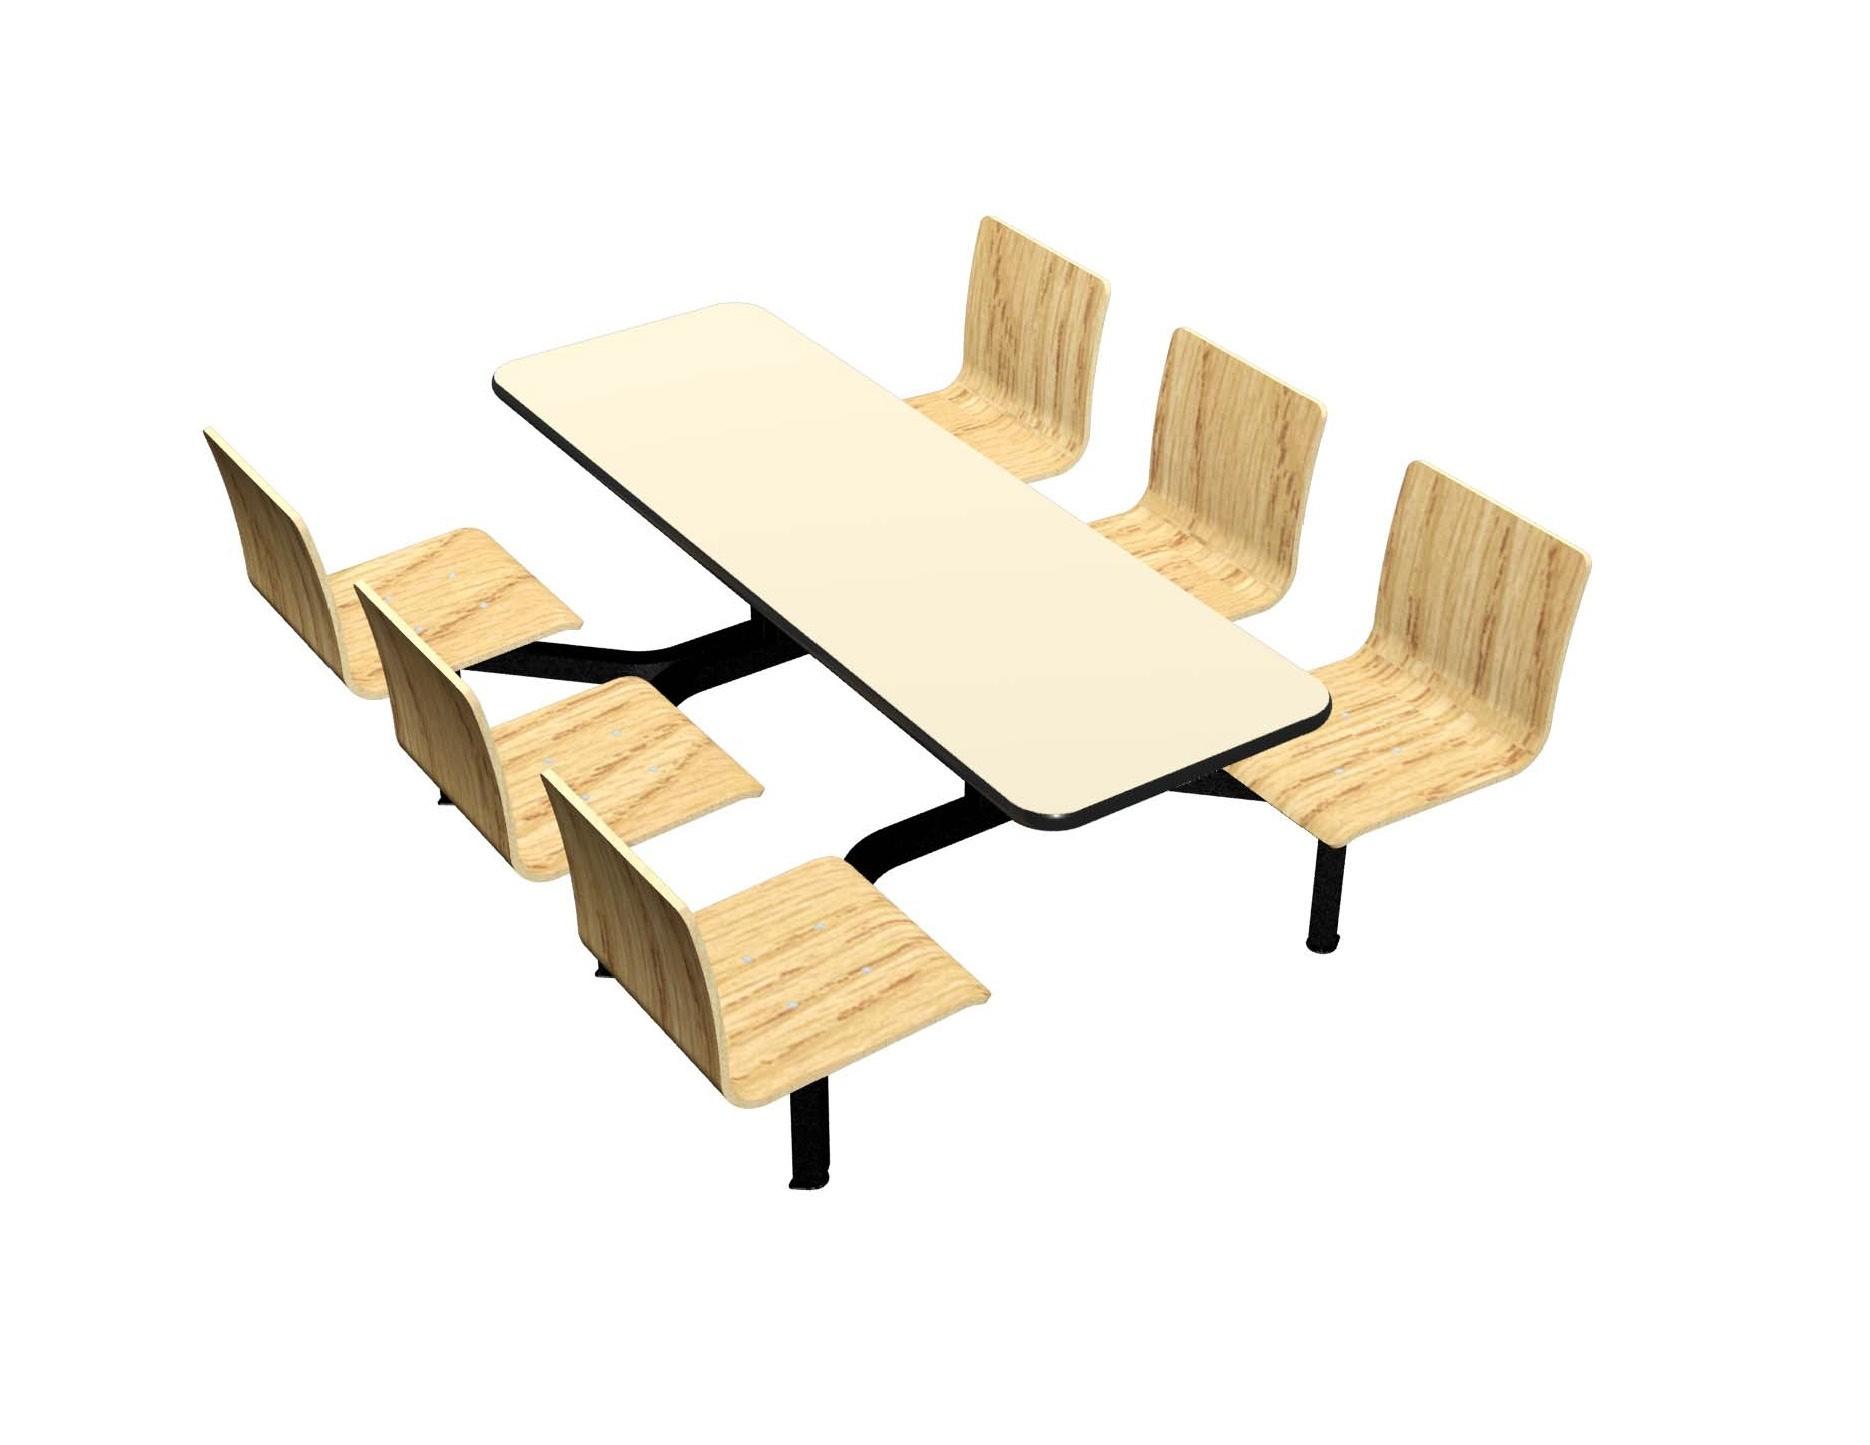 Wallaby laminate table, Black vinyl edge, Legacy chairhead in Natural Oak laminate